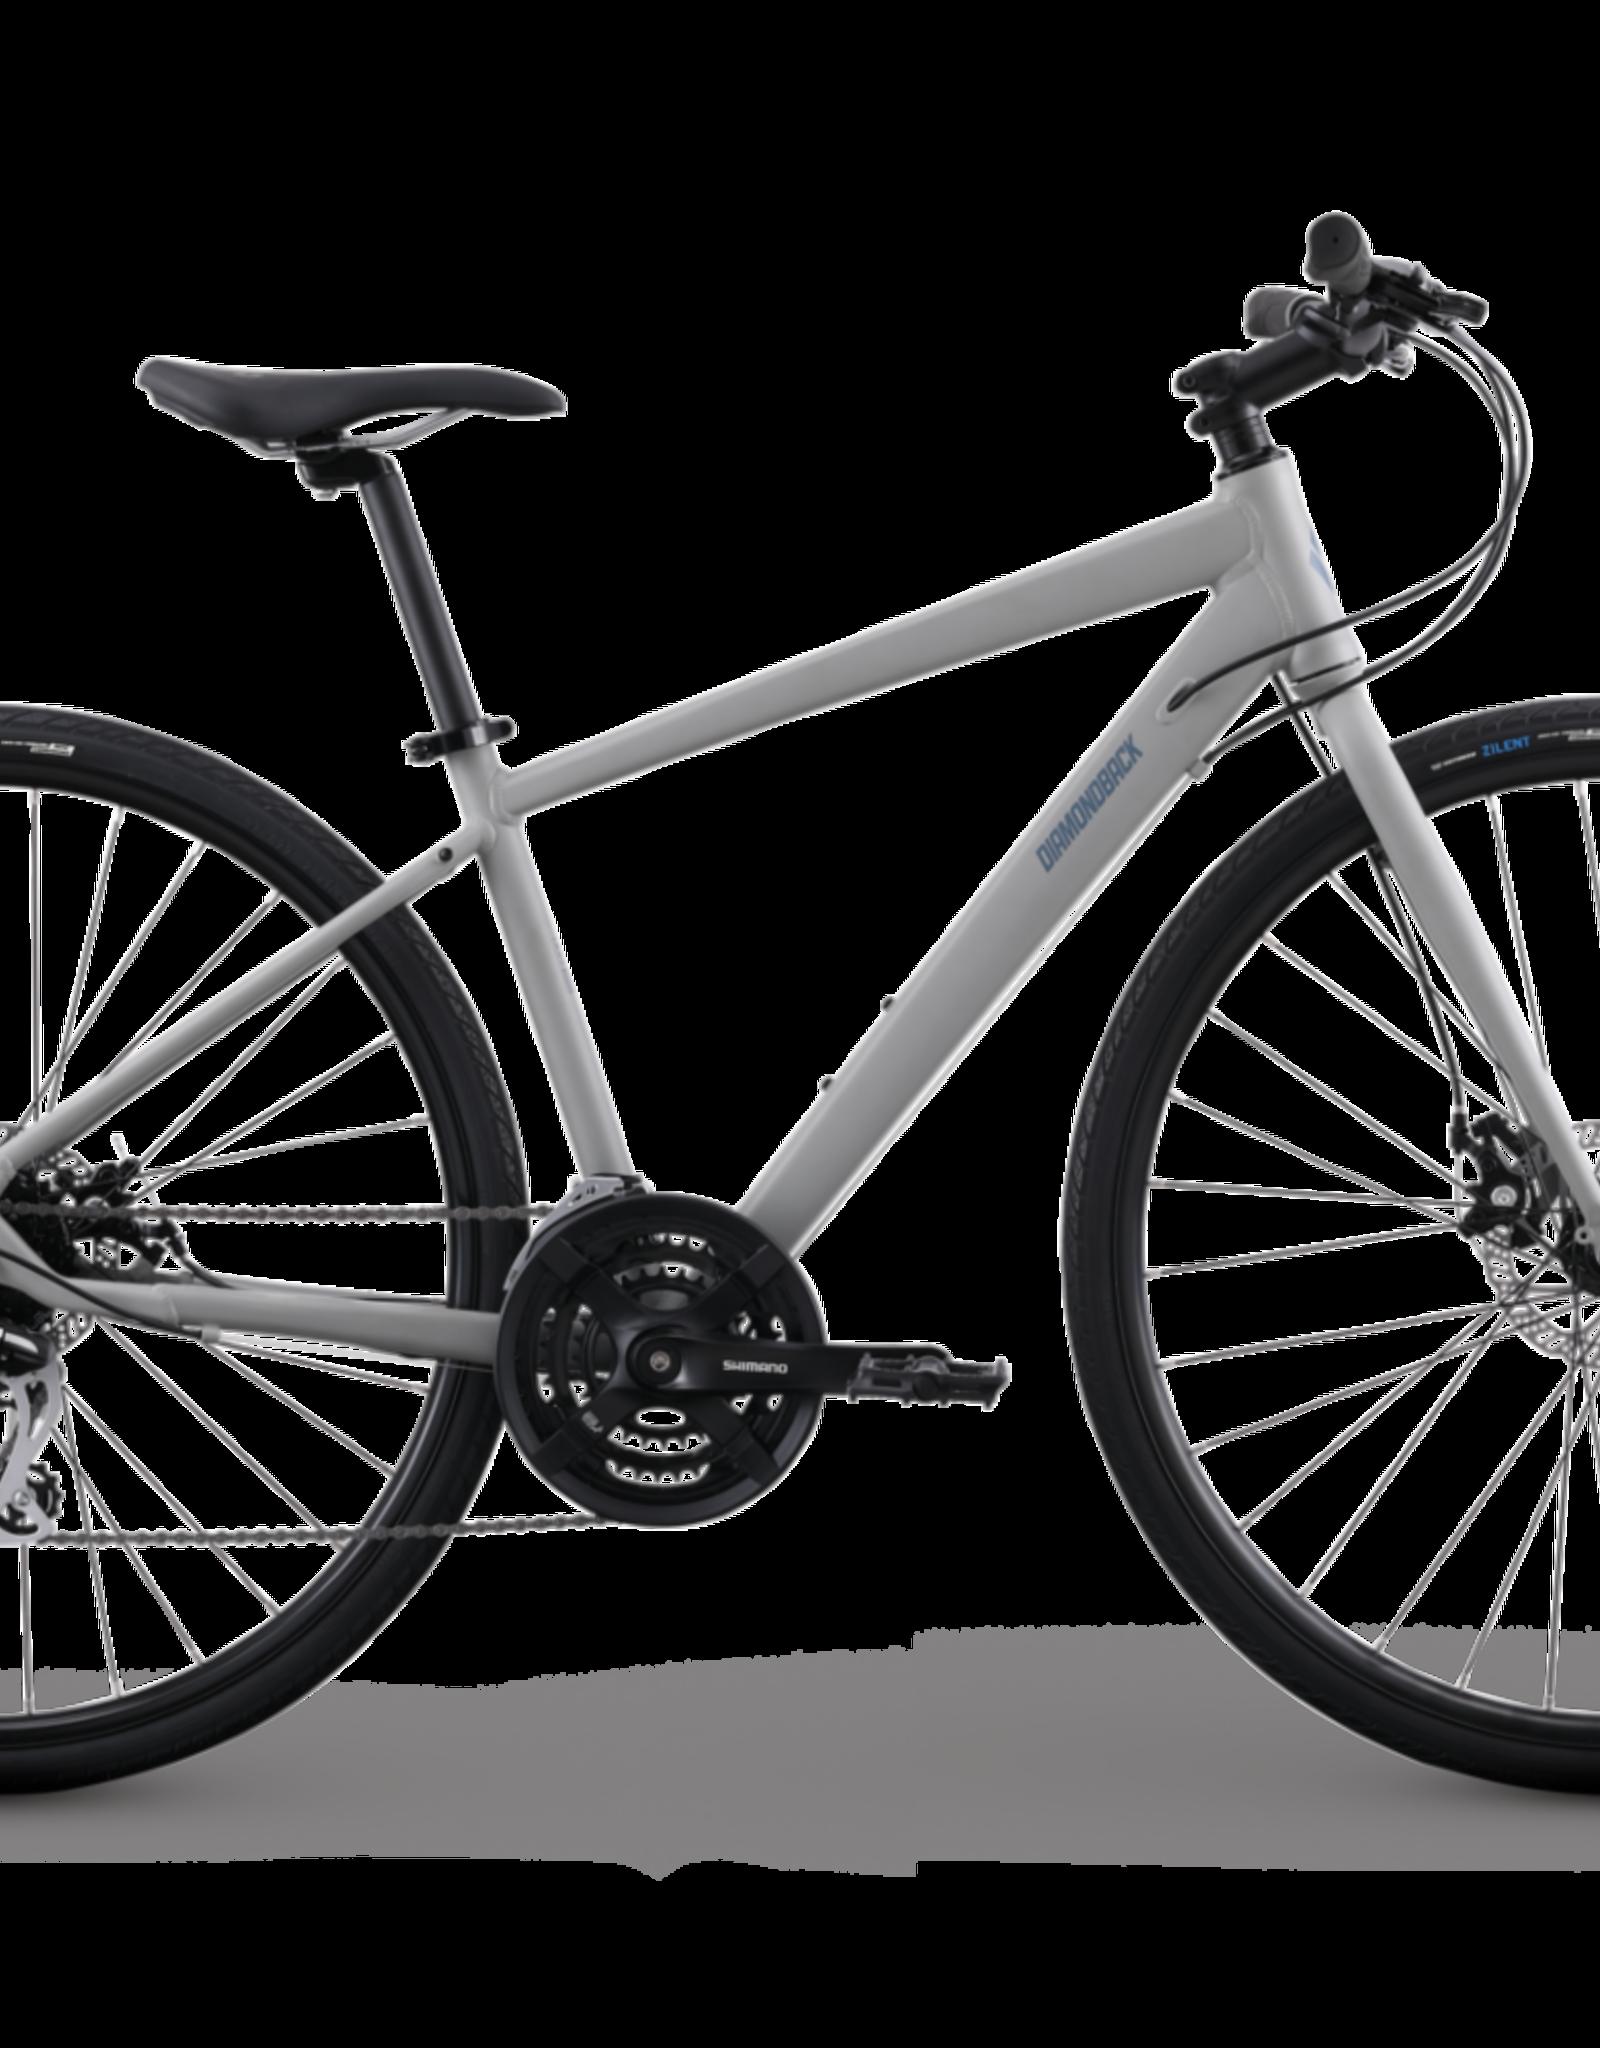 2021 Metric 2 Commuter Bicycle, Mechanical Brake